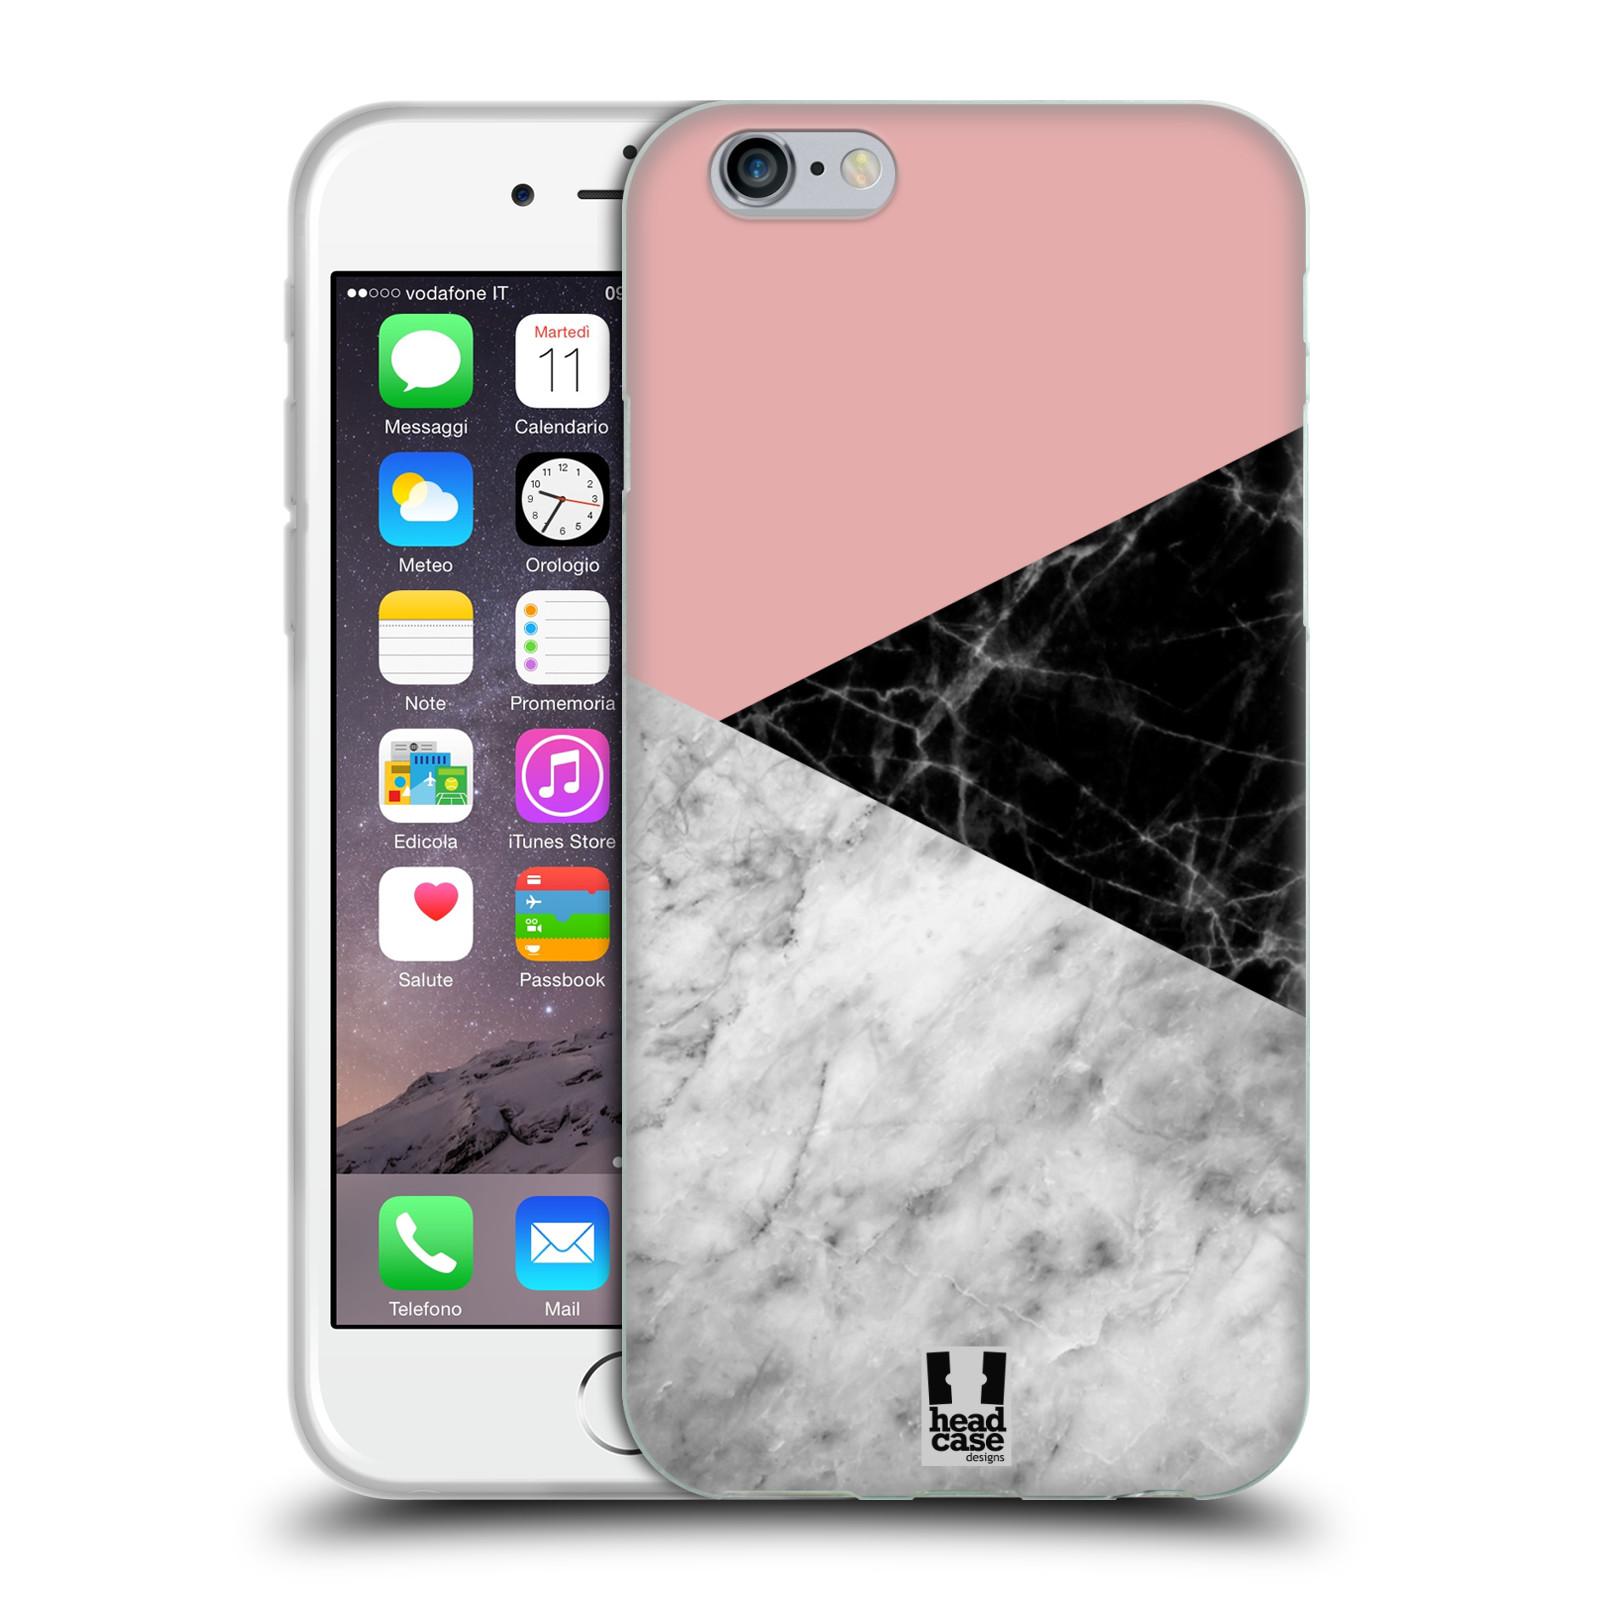 Silikonové pouzdro na mobil Apple iPhone 6 - Head Case - Mramor mix